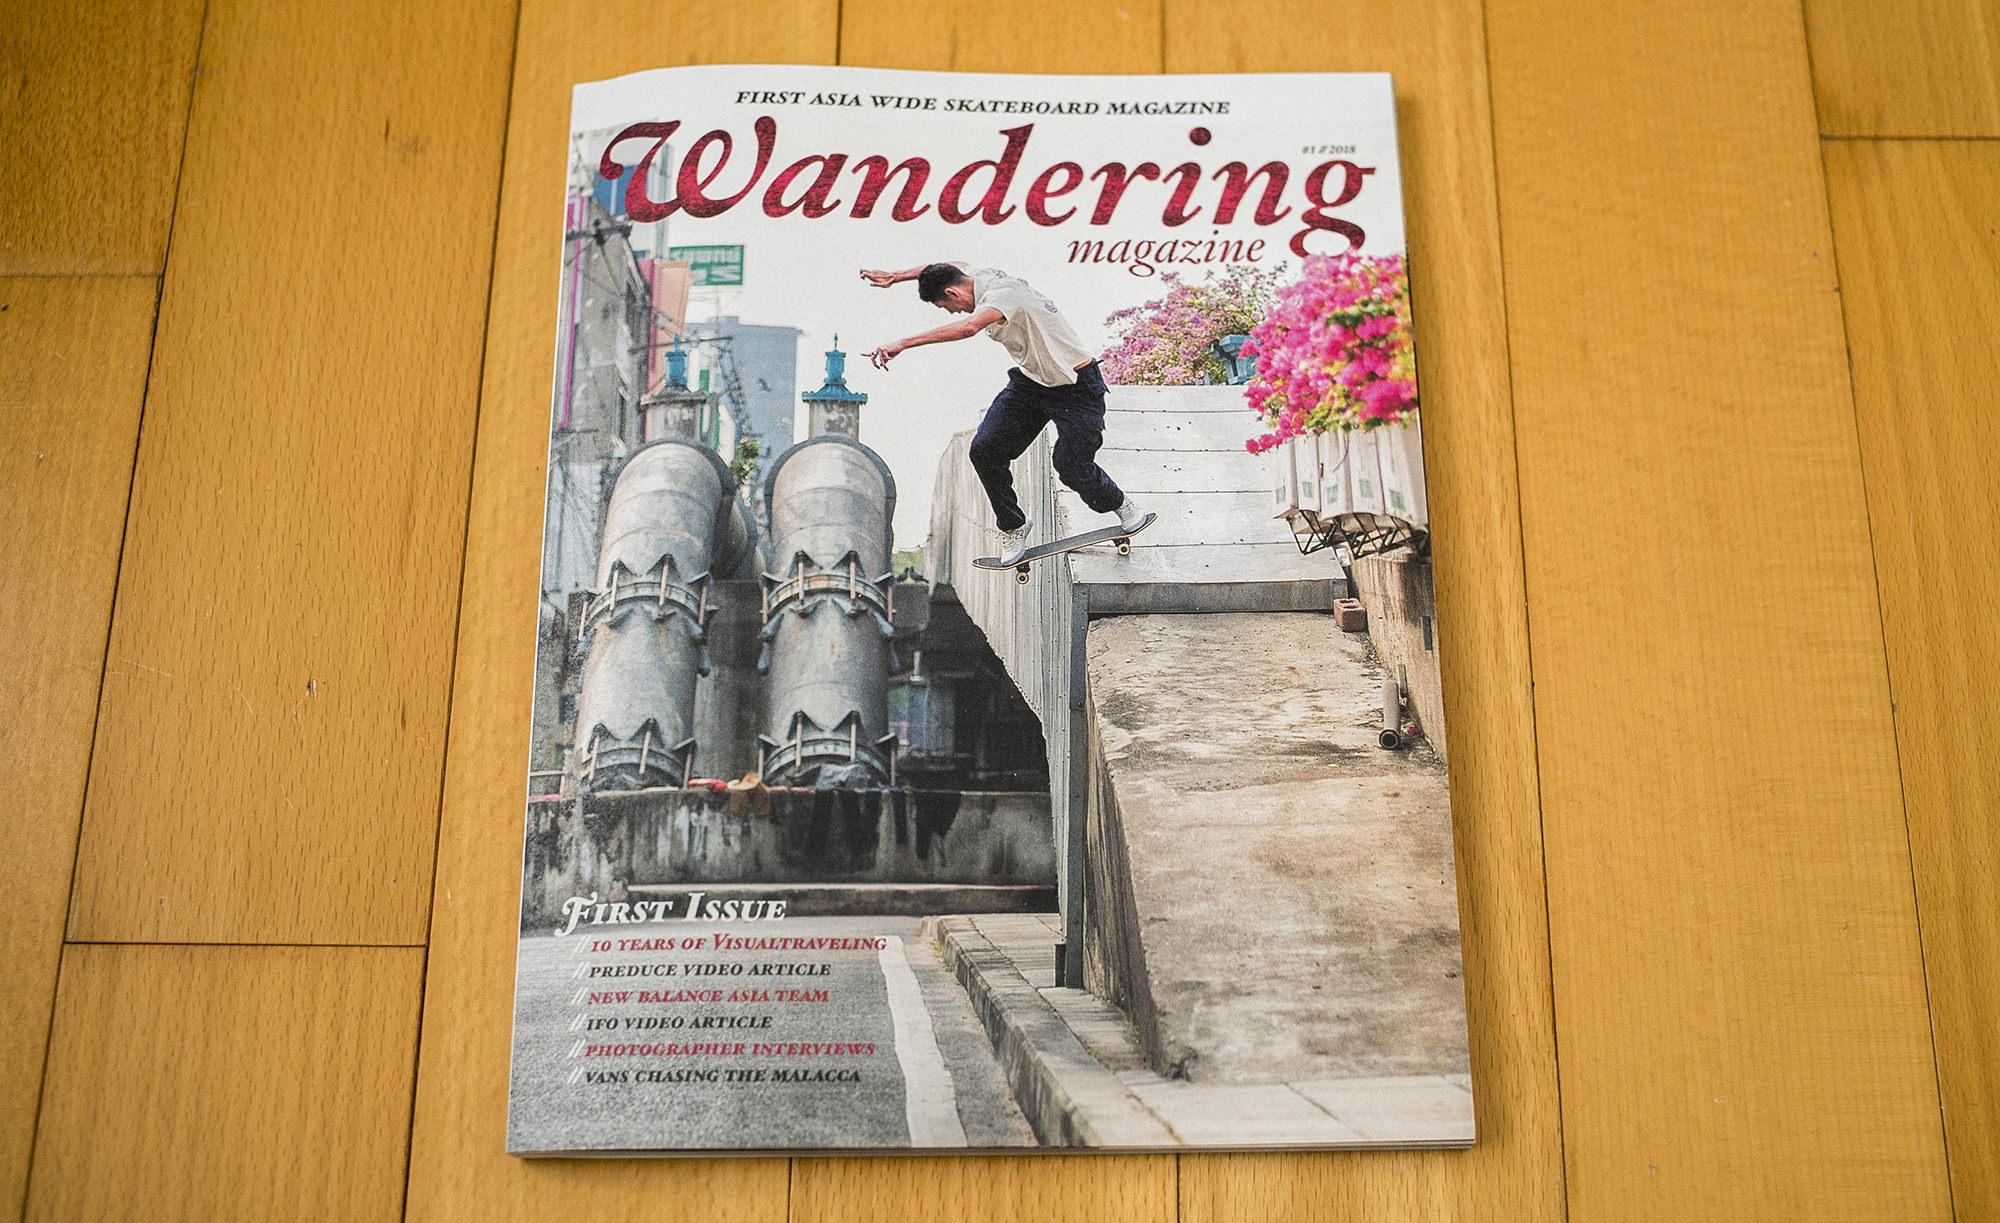 Wondering Mag 2018 VT Cover LOWQ 2000P